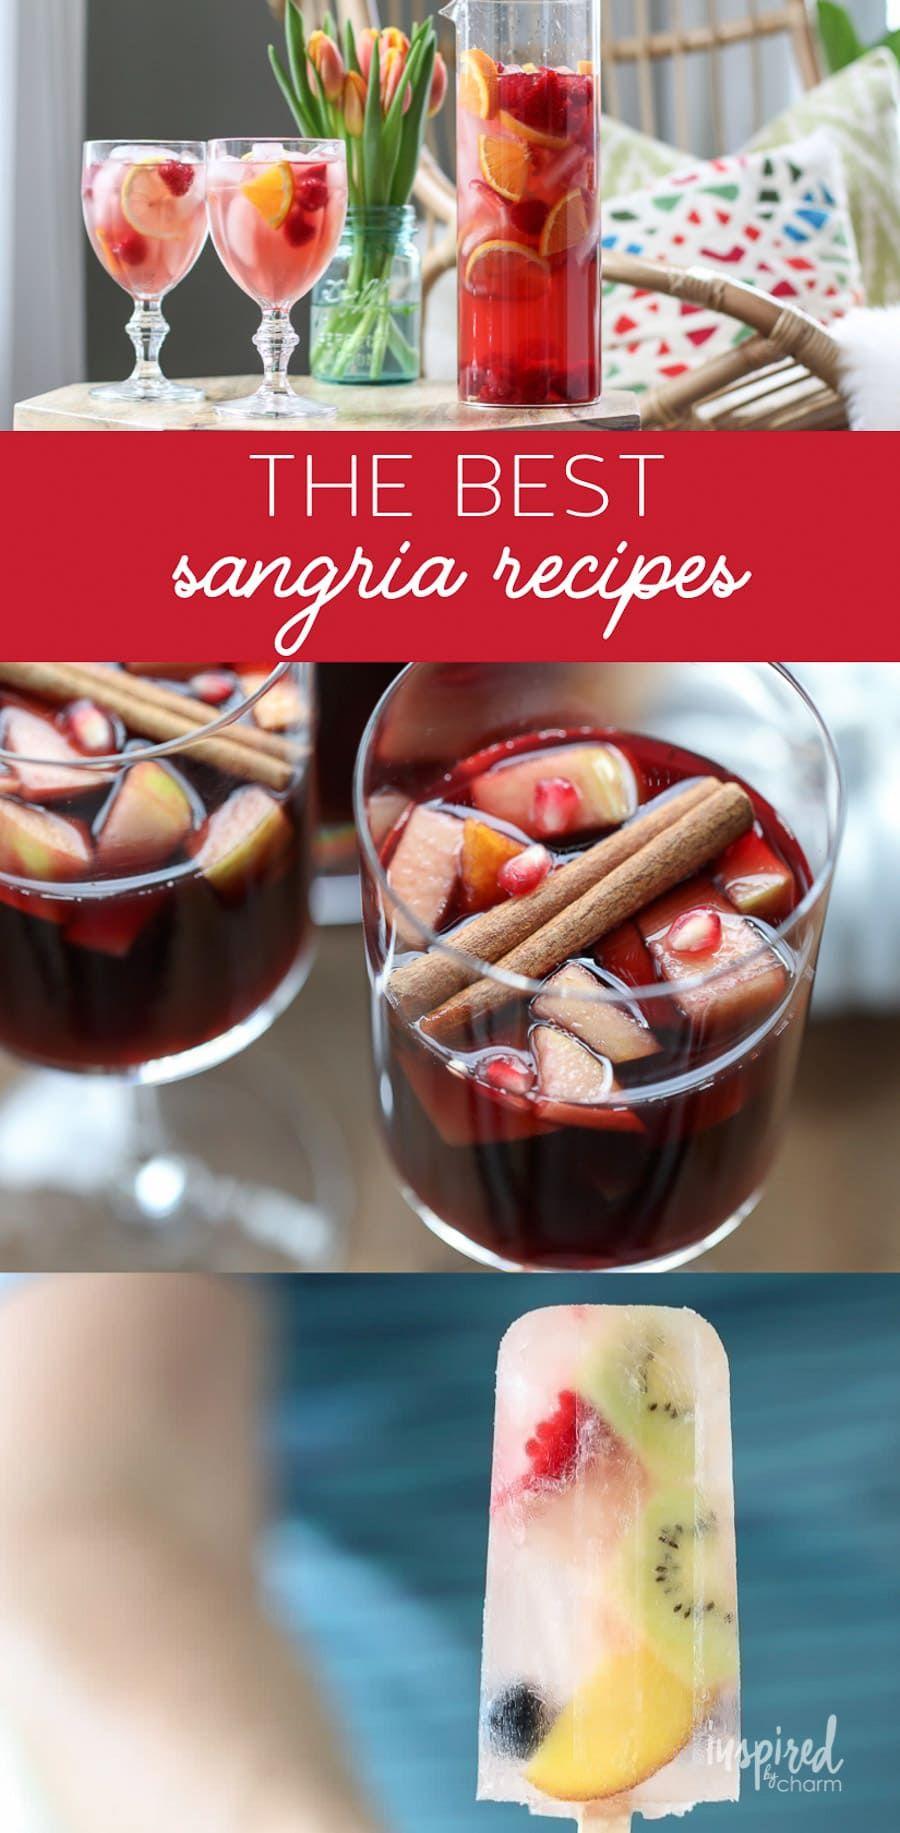 The Best Sangria Recipes Sangria Recipe Cocktail Thebestsangria Cocktails Sangriarecipe In 2020 Best Sangria Recipe Sangria Recipes Delicious Drink Recipes